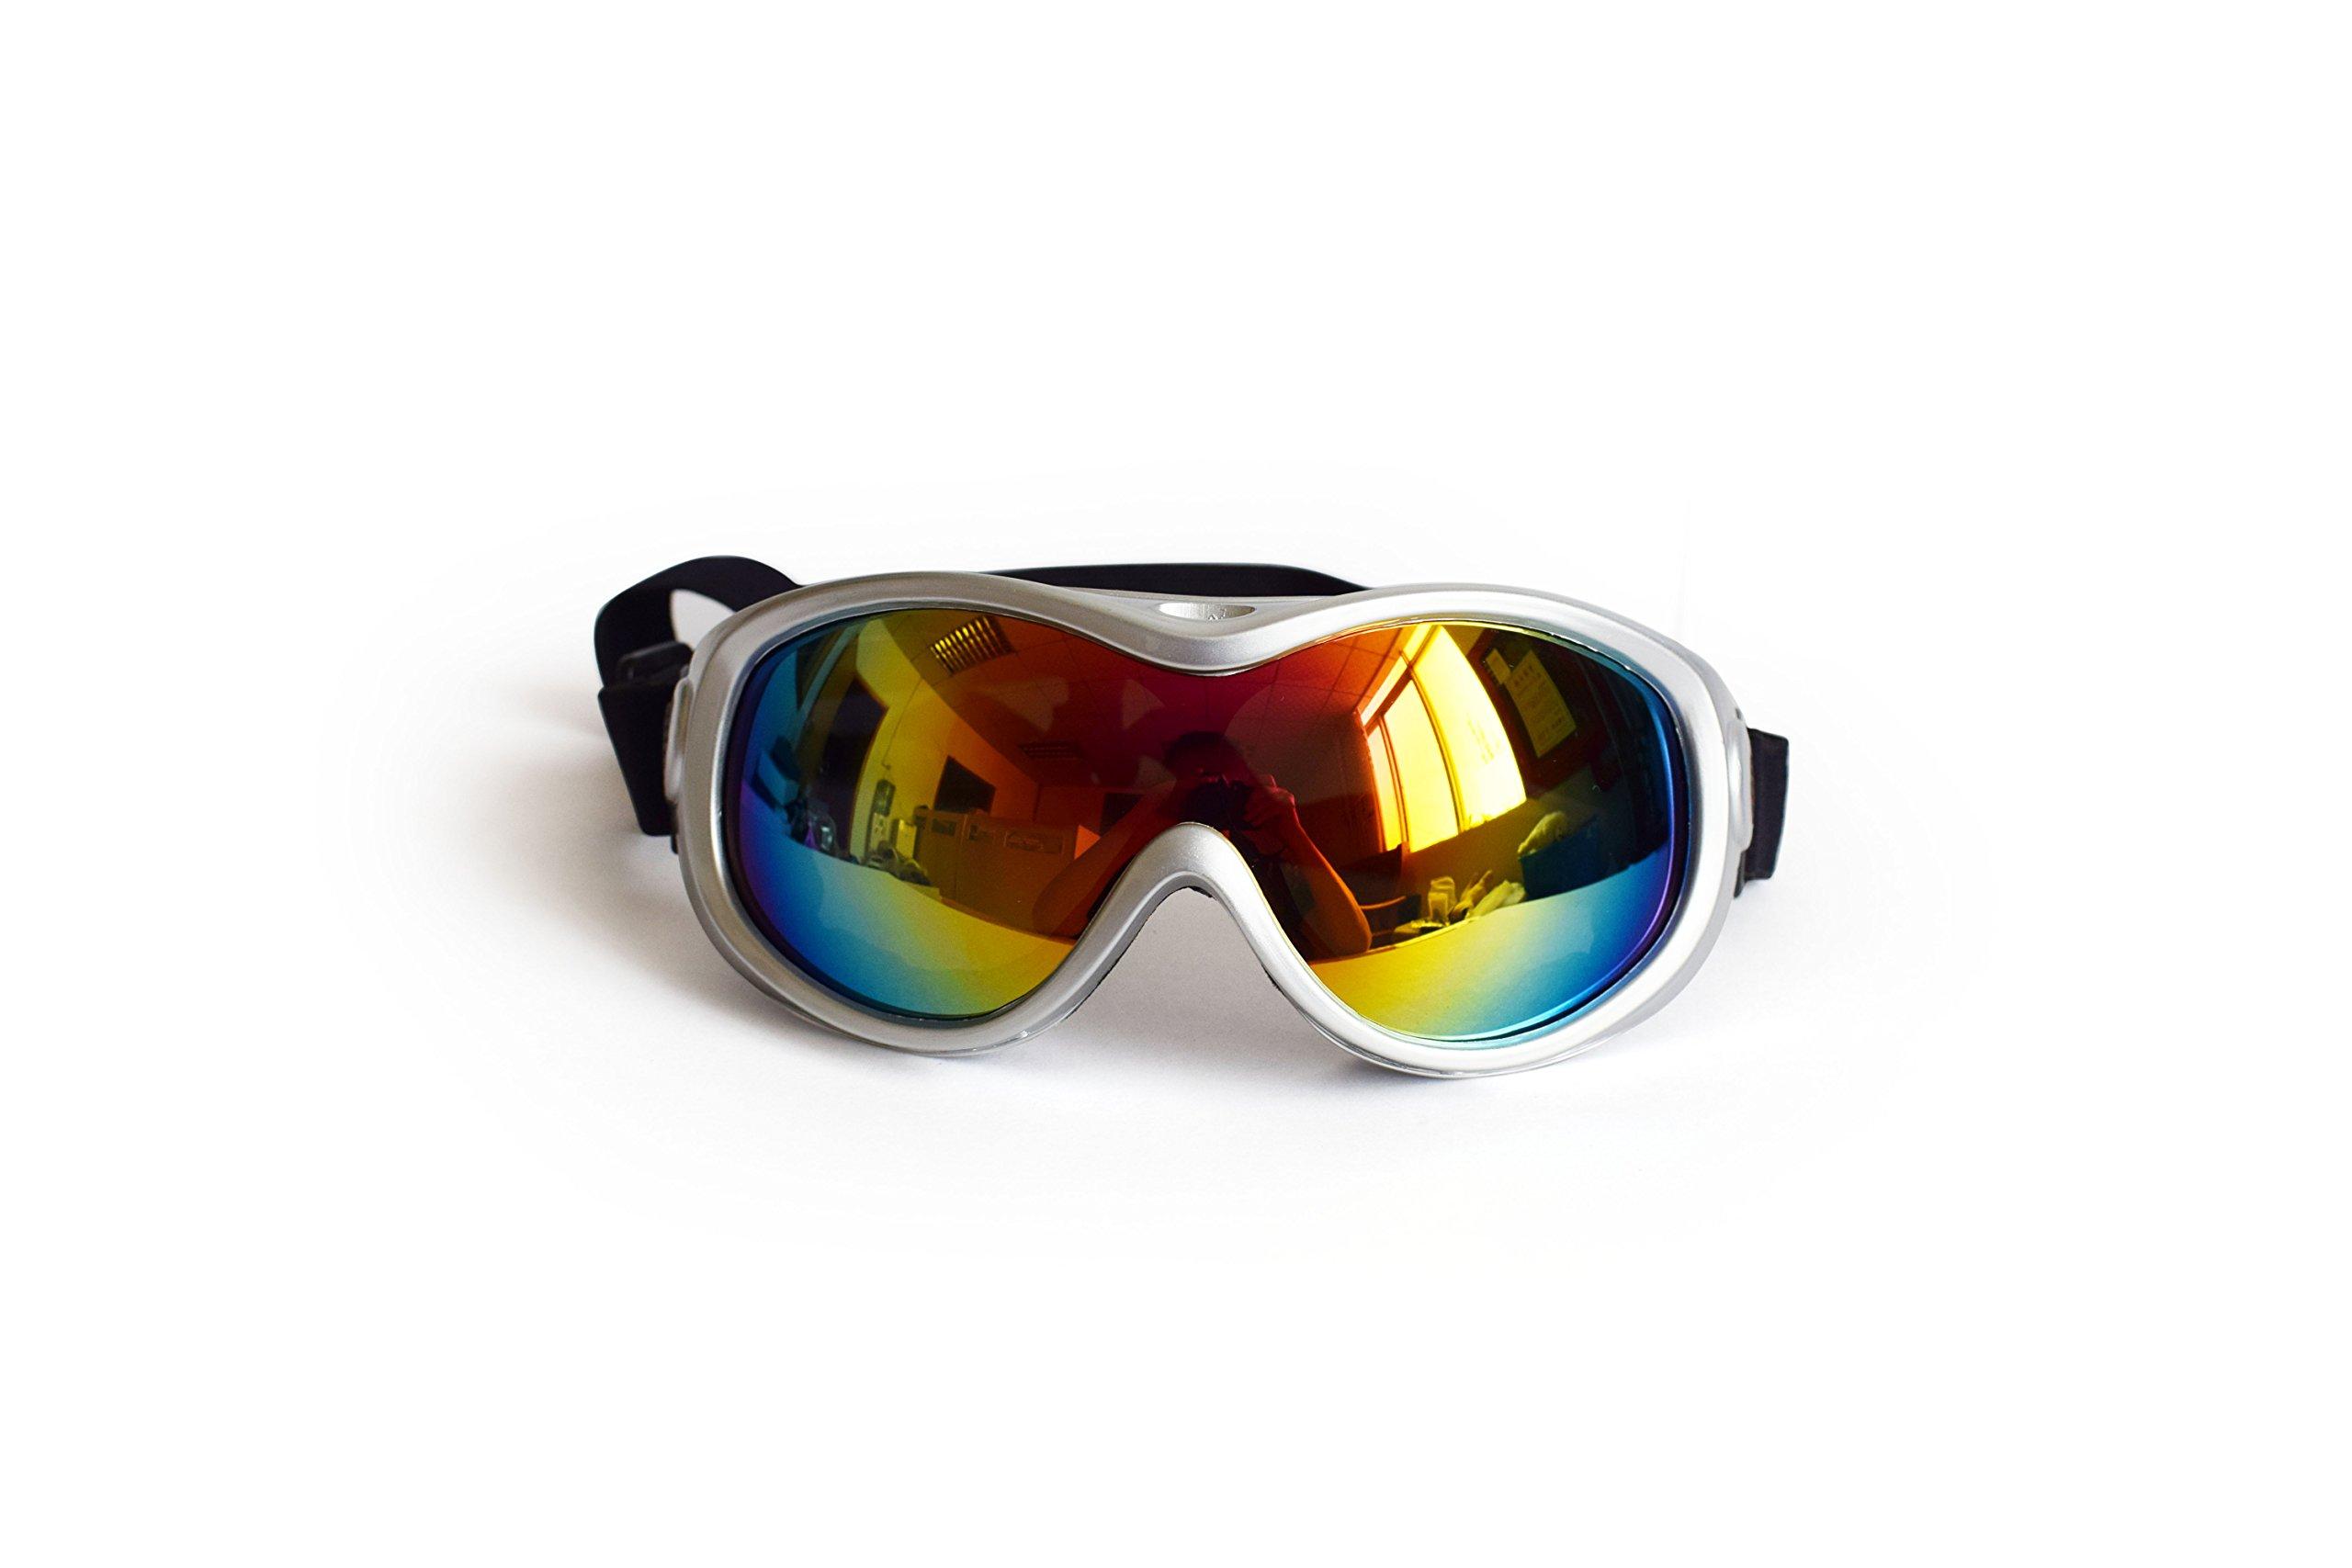 Tenderlybaby Large Dog Glaesses Anti-Fog Glasses Sun Glassess Goggles UV Protection Safety Goggles Snow Skiing Protection Goggles with Removable Starp for Dog (White)